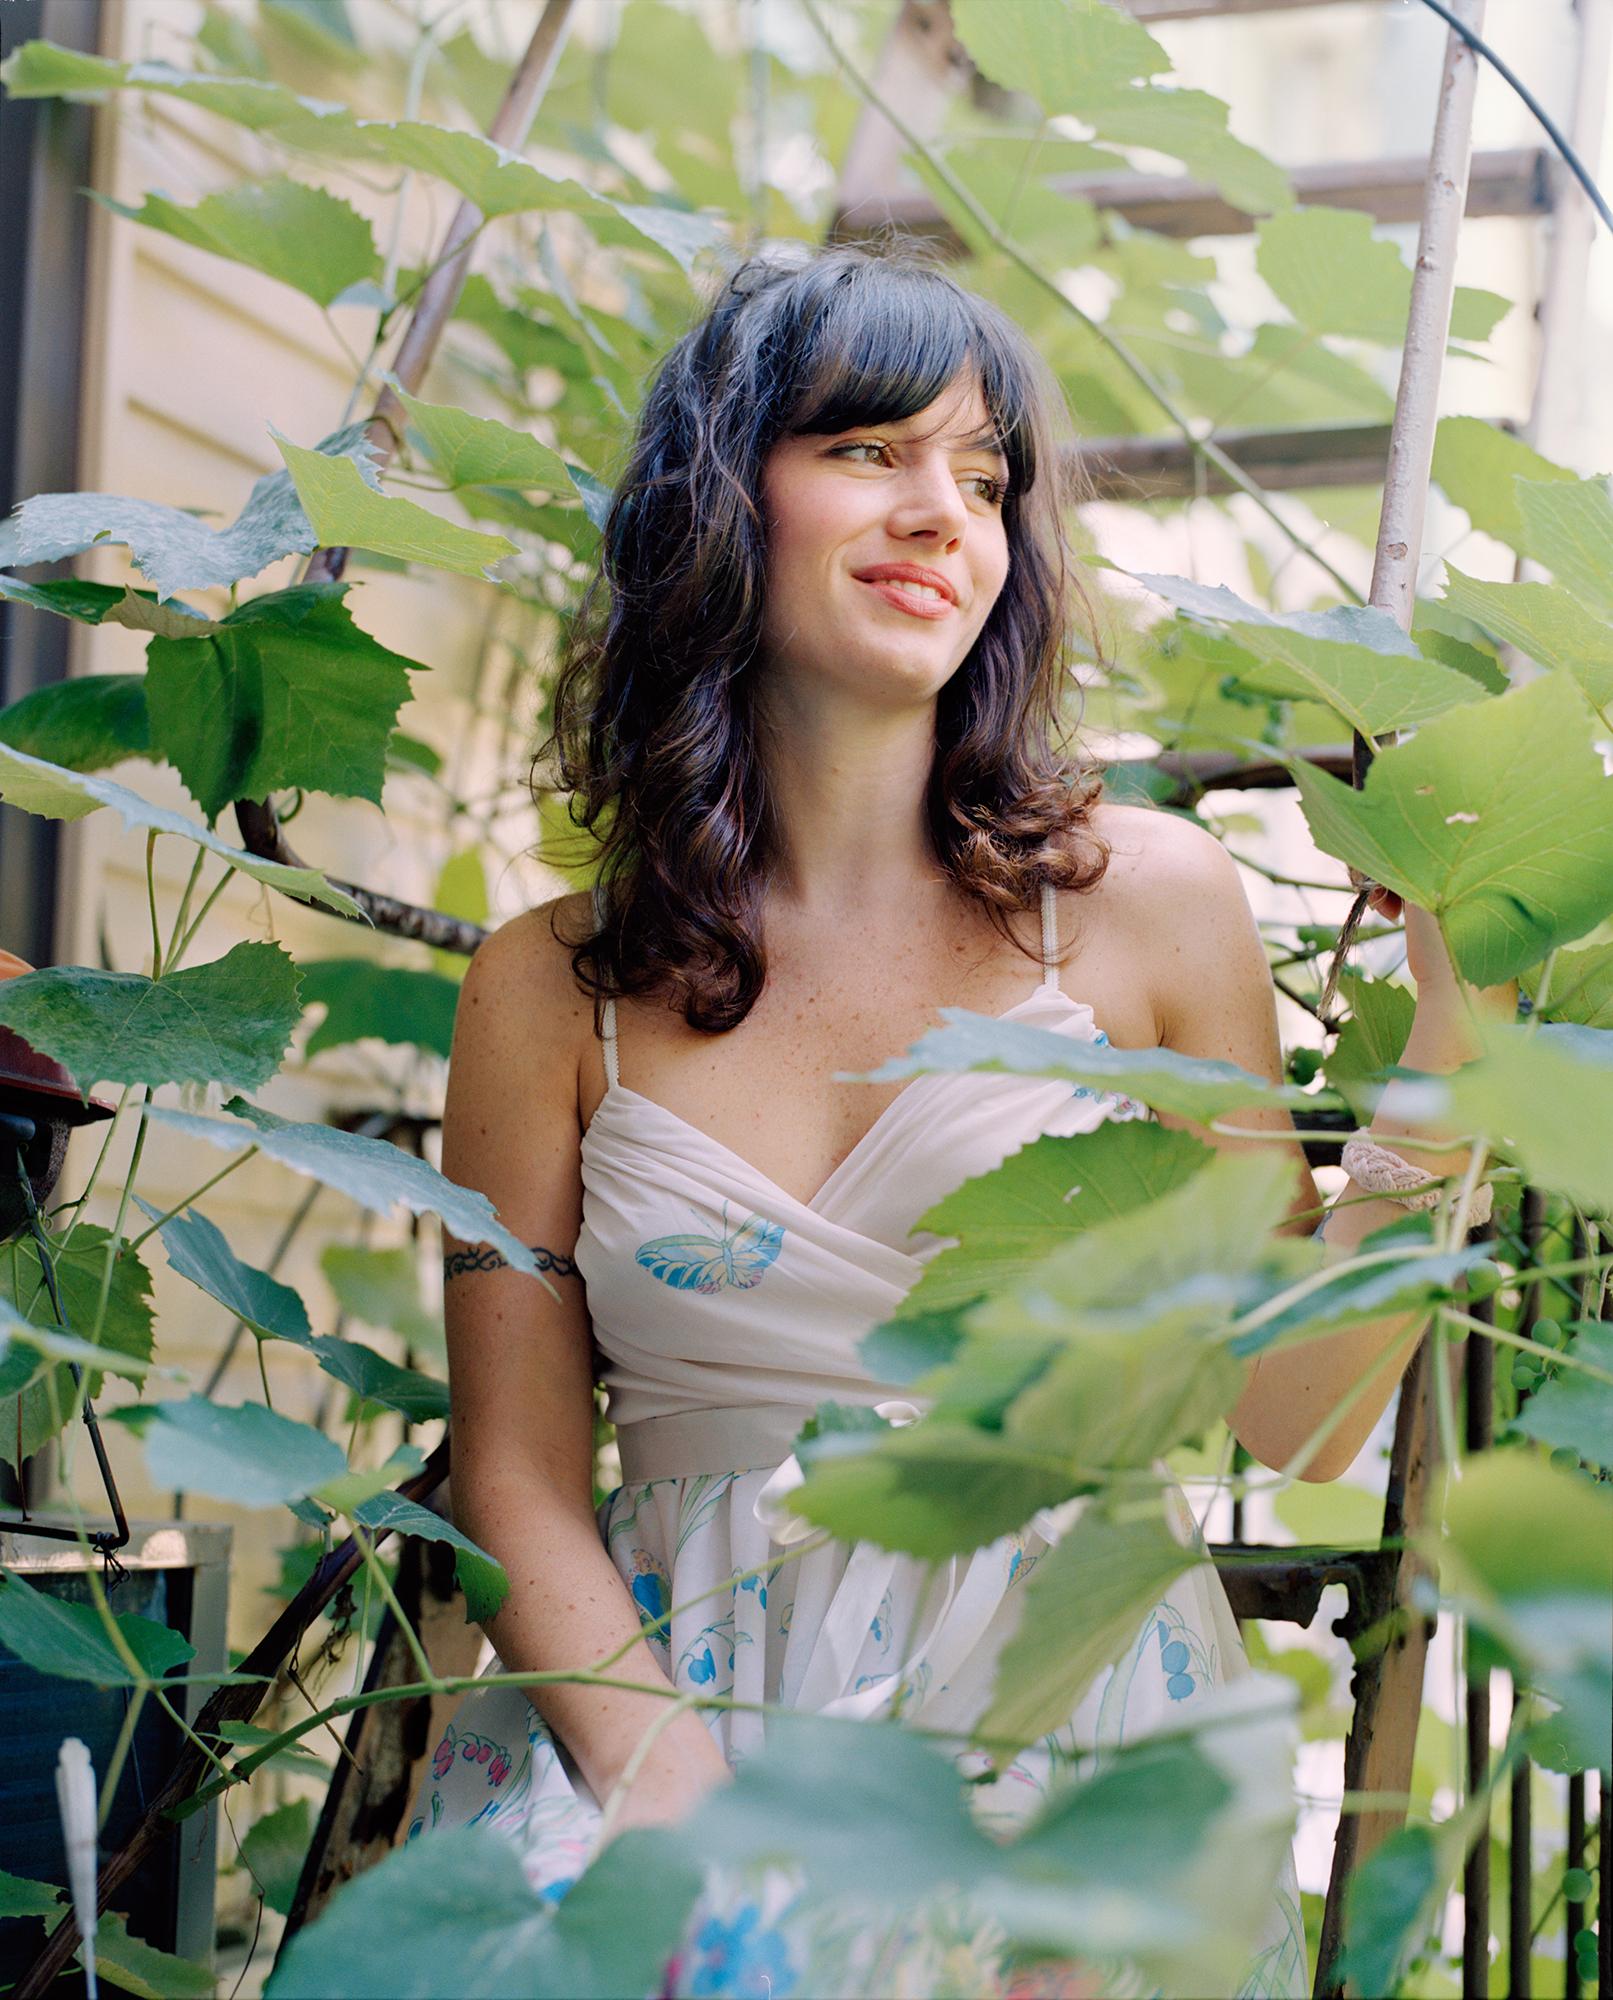 Leah Tinari, Artist, New York, NY